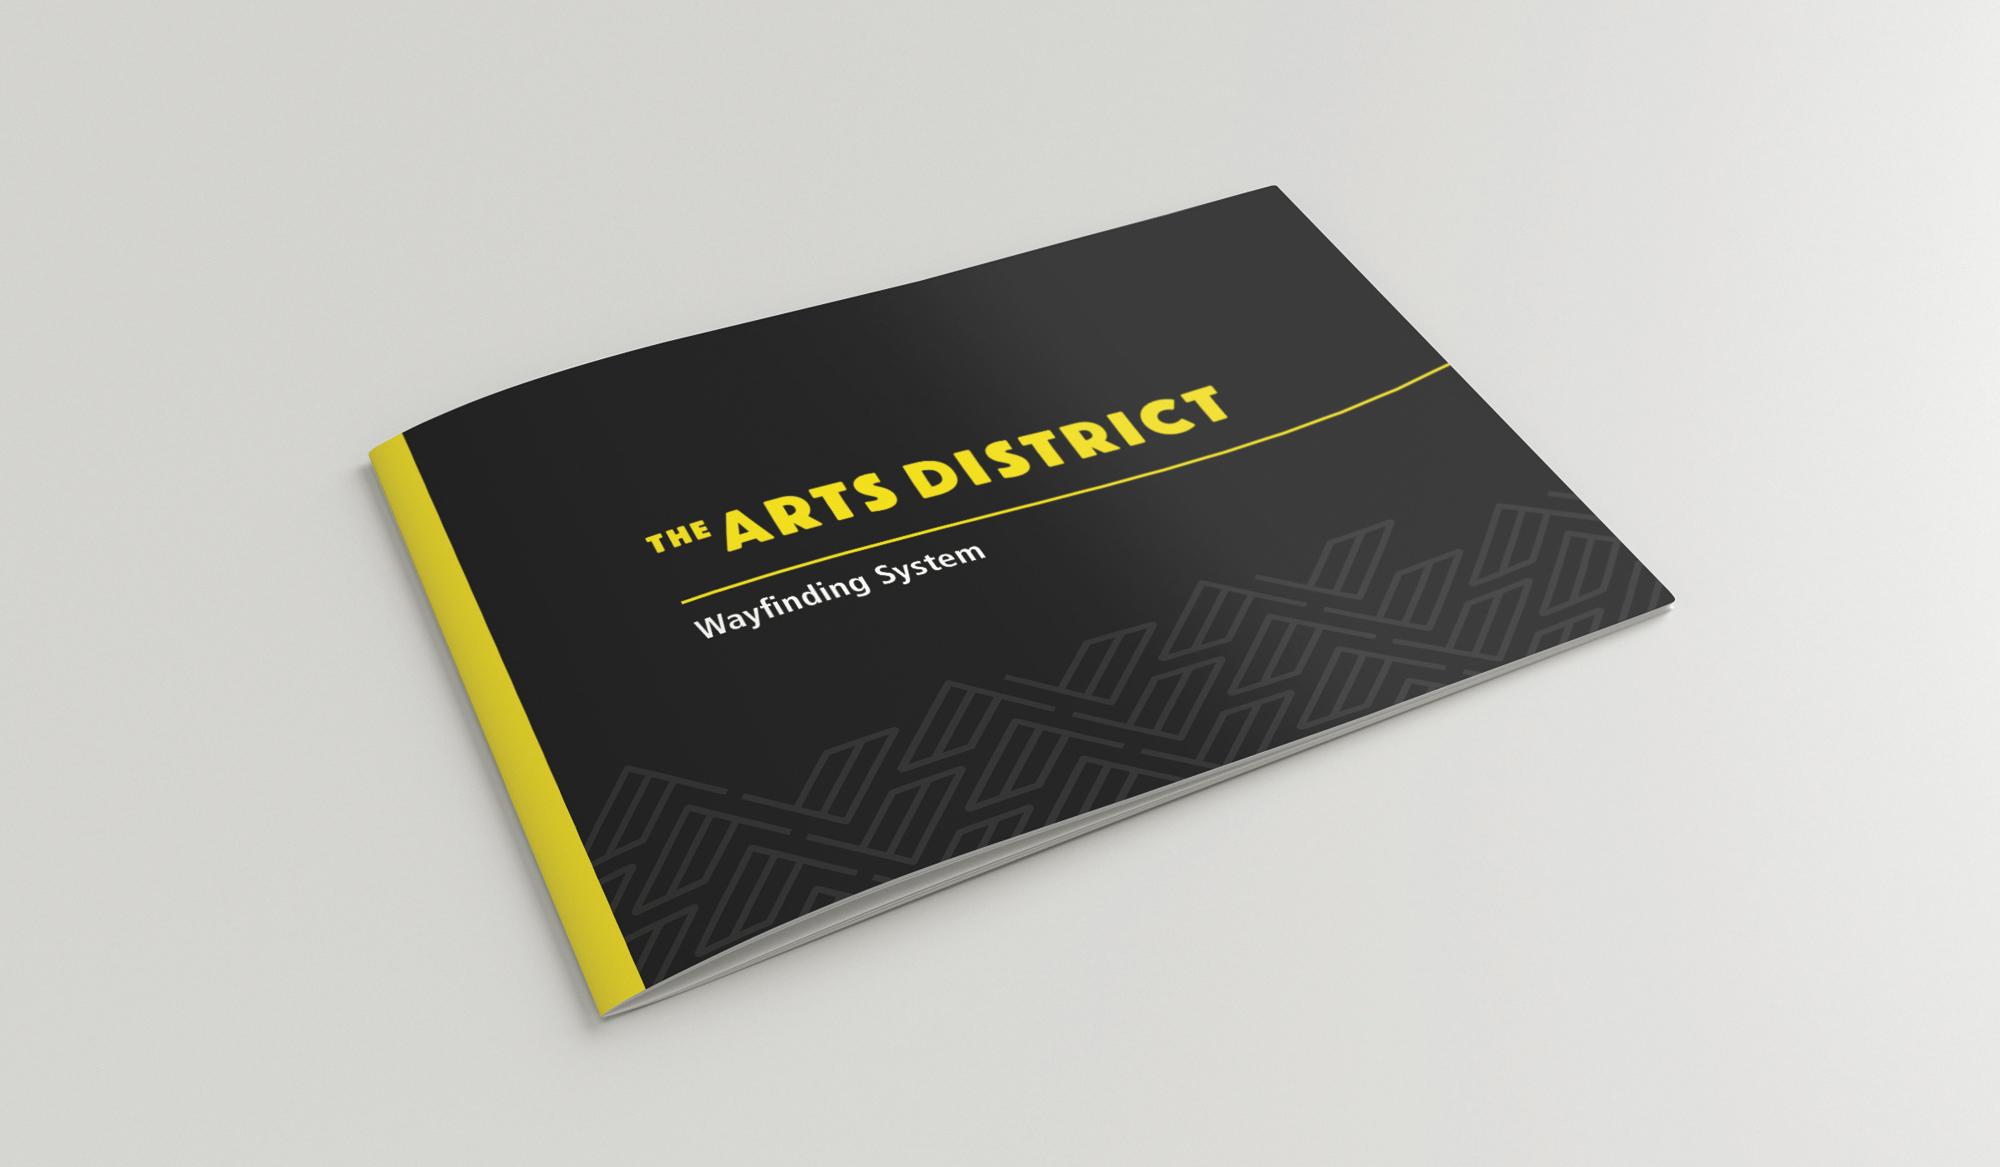 ElimaPeter-Arts District-1.jpg